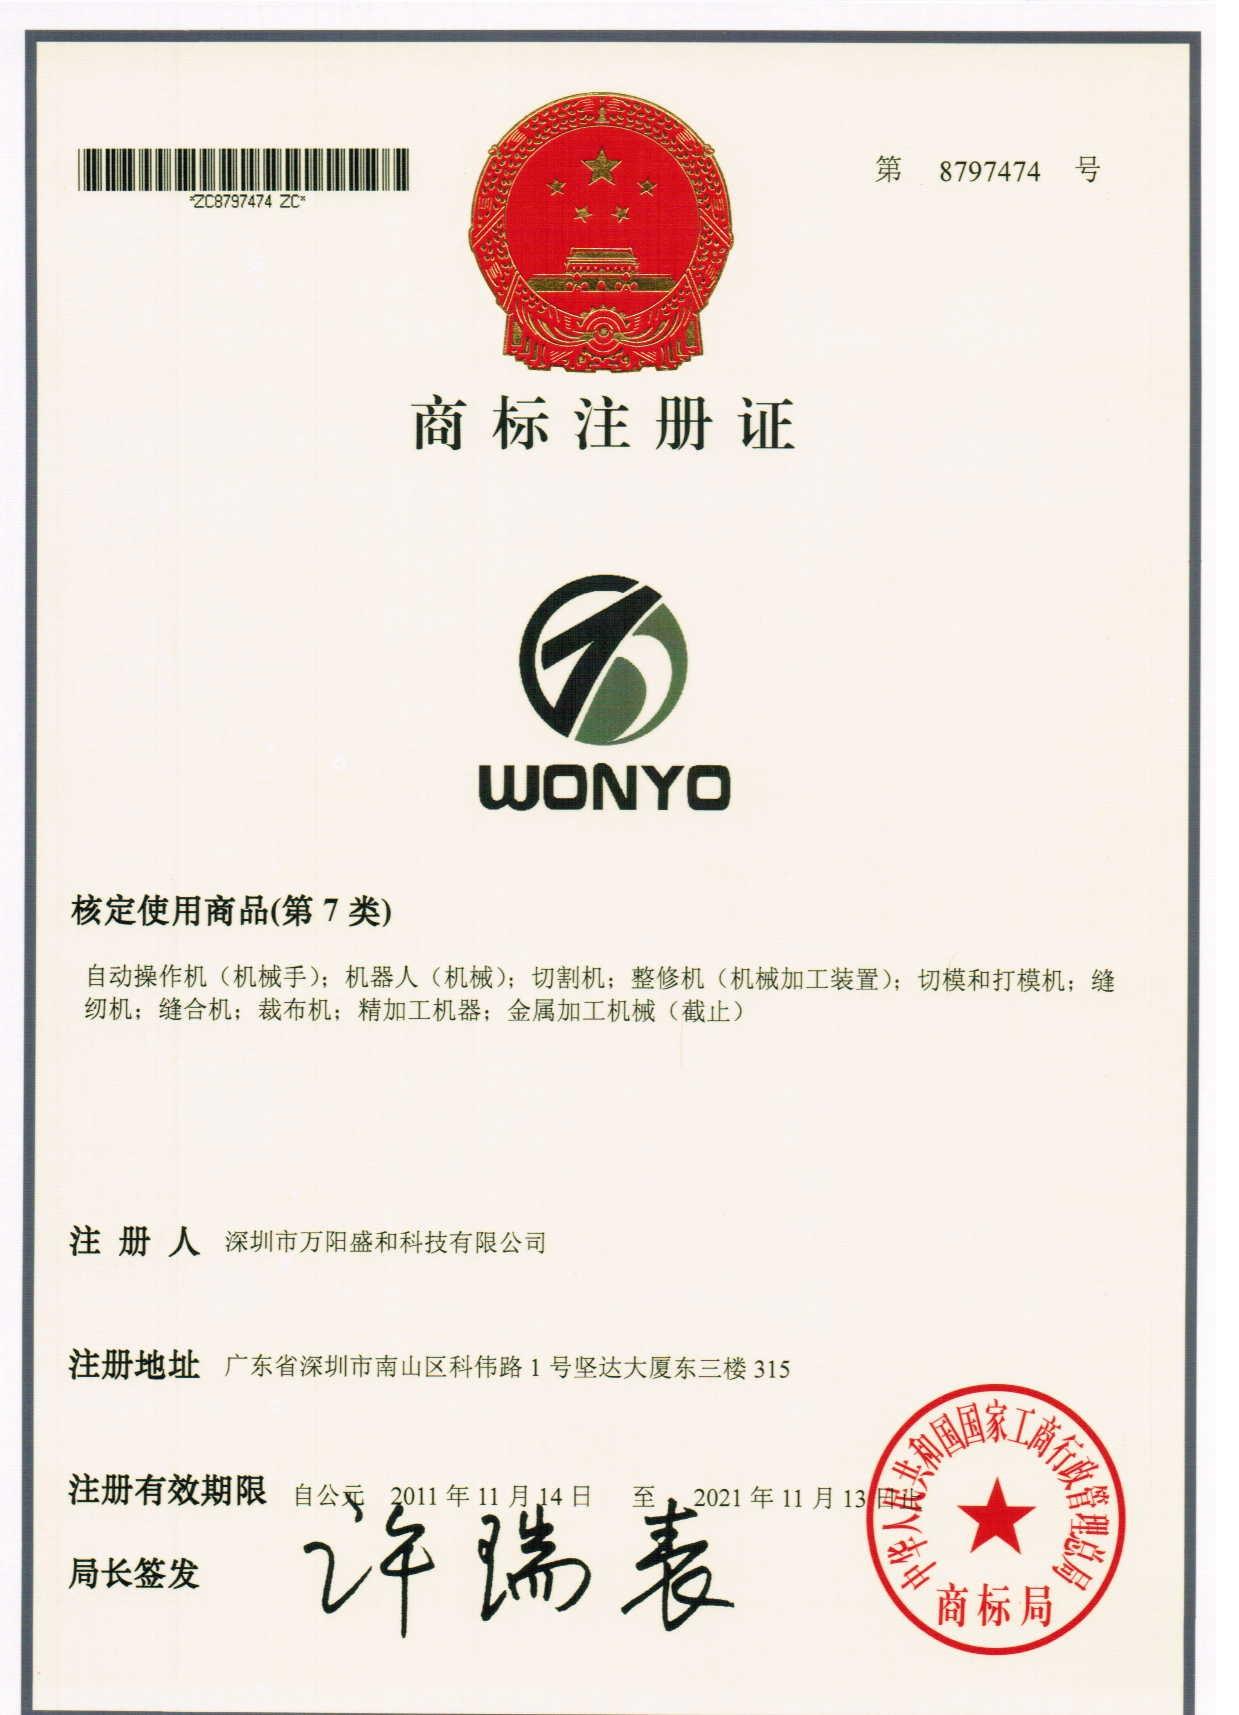 WONYO Certificates